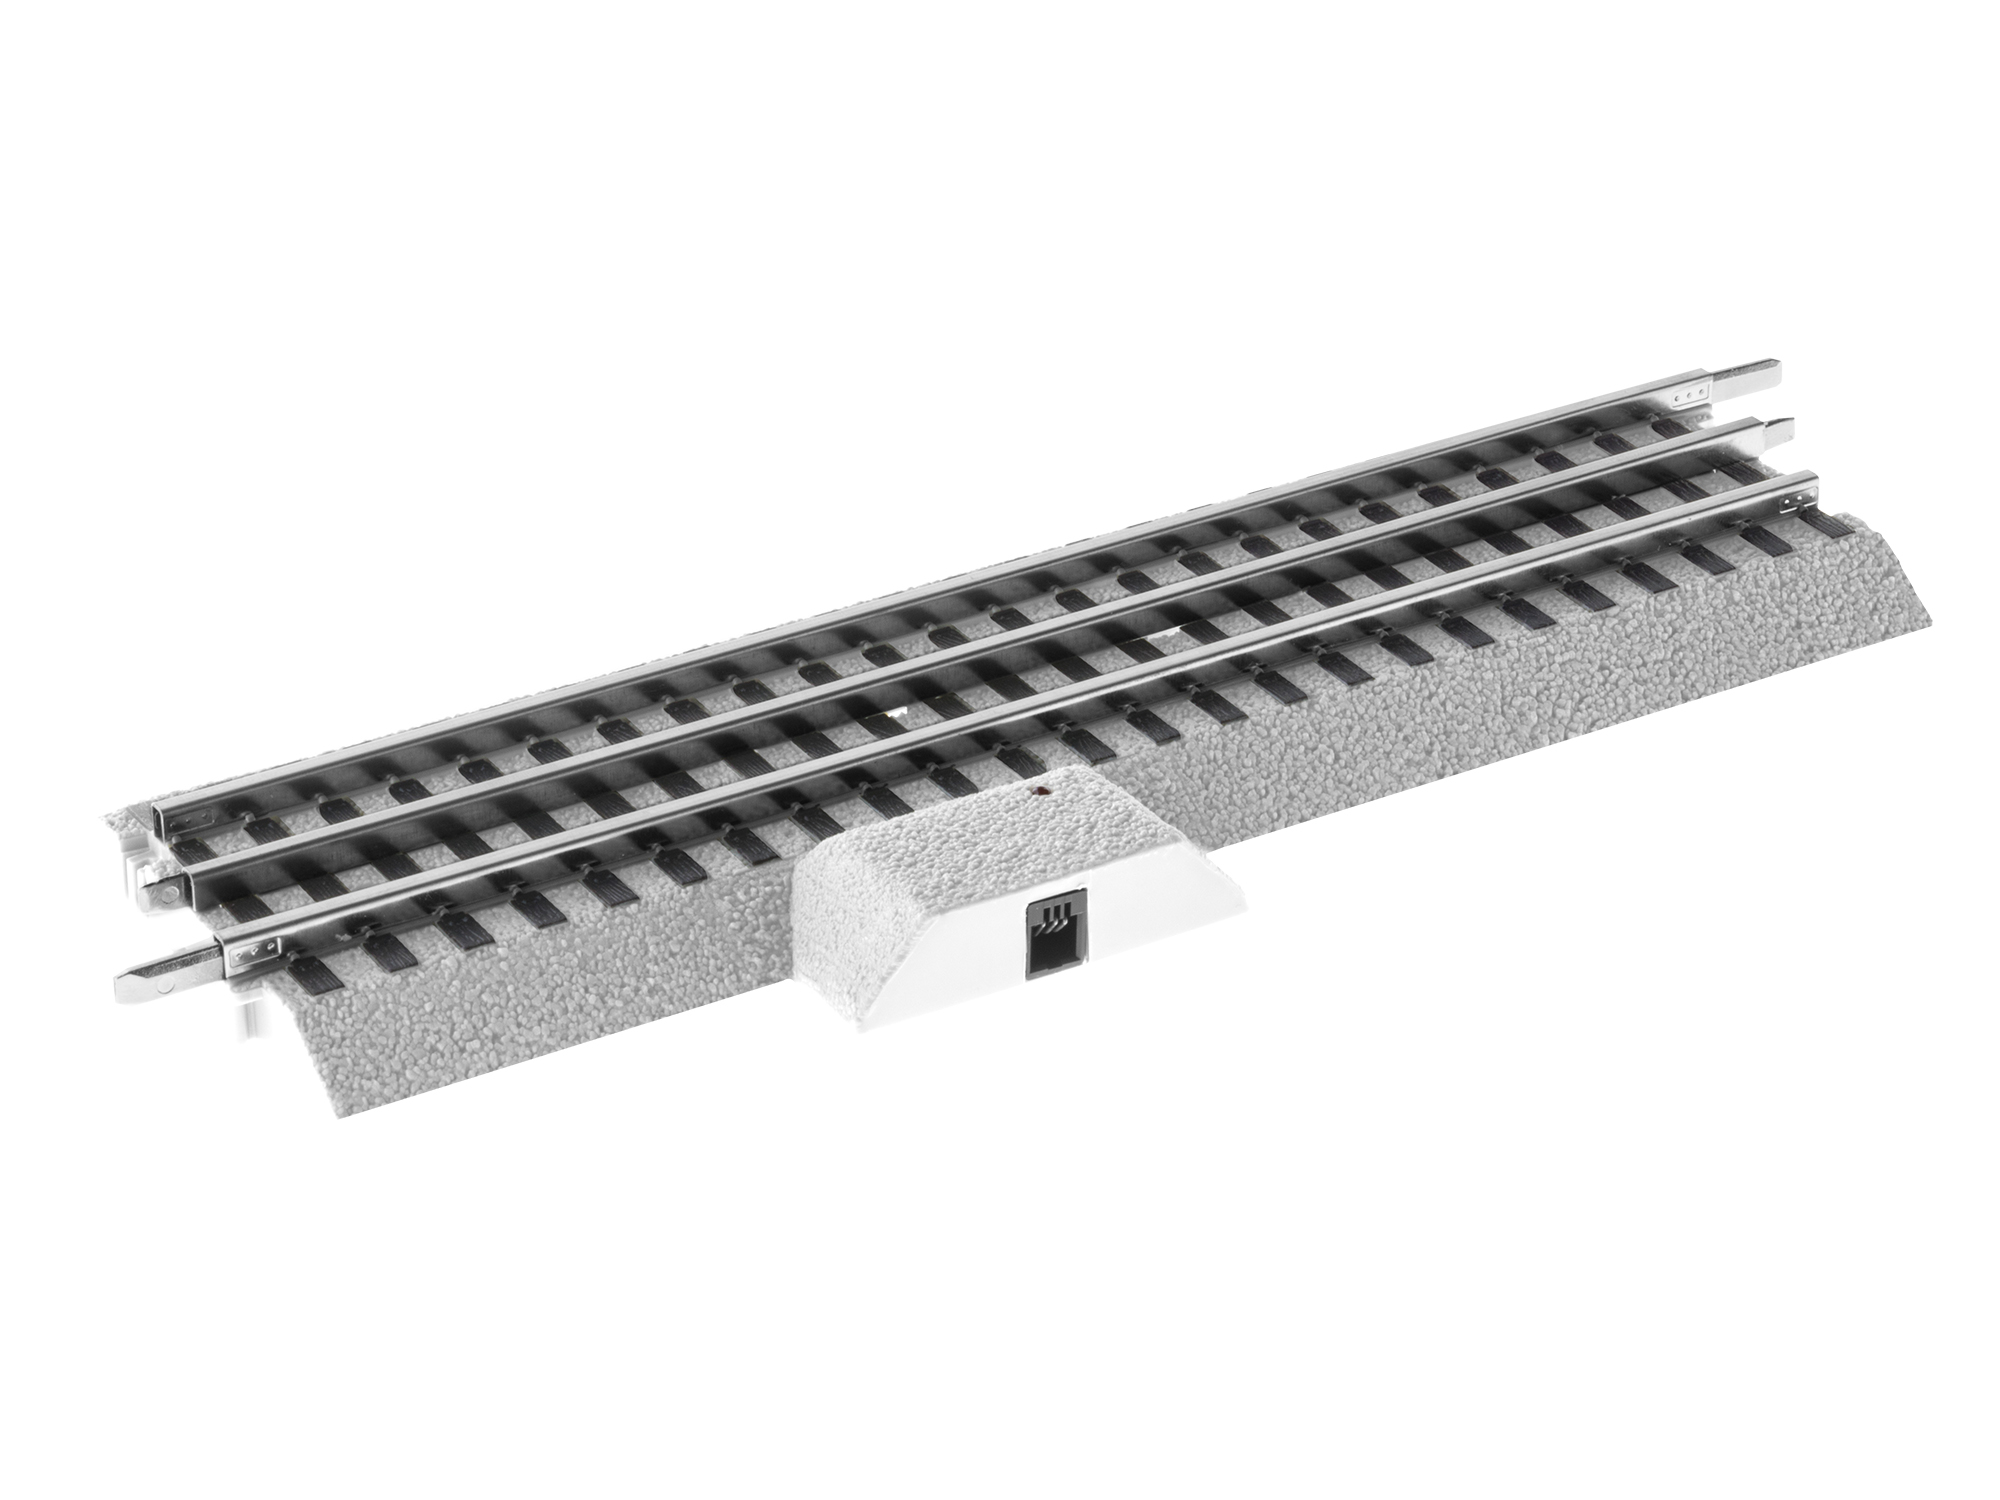 Lionel 685391 O PEP Activation Track FasTrack Ballast 434-685391